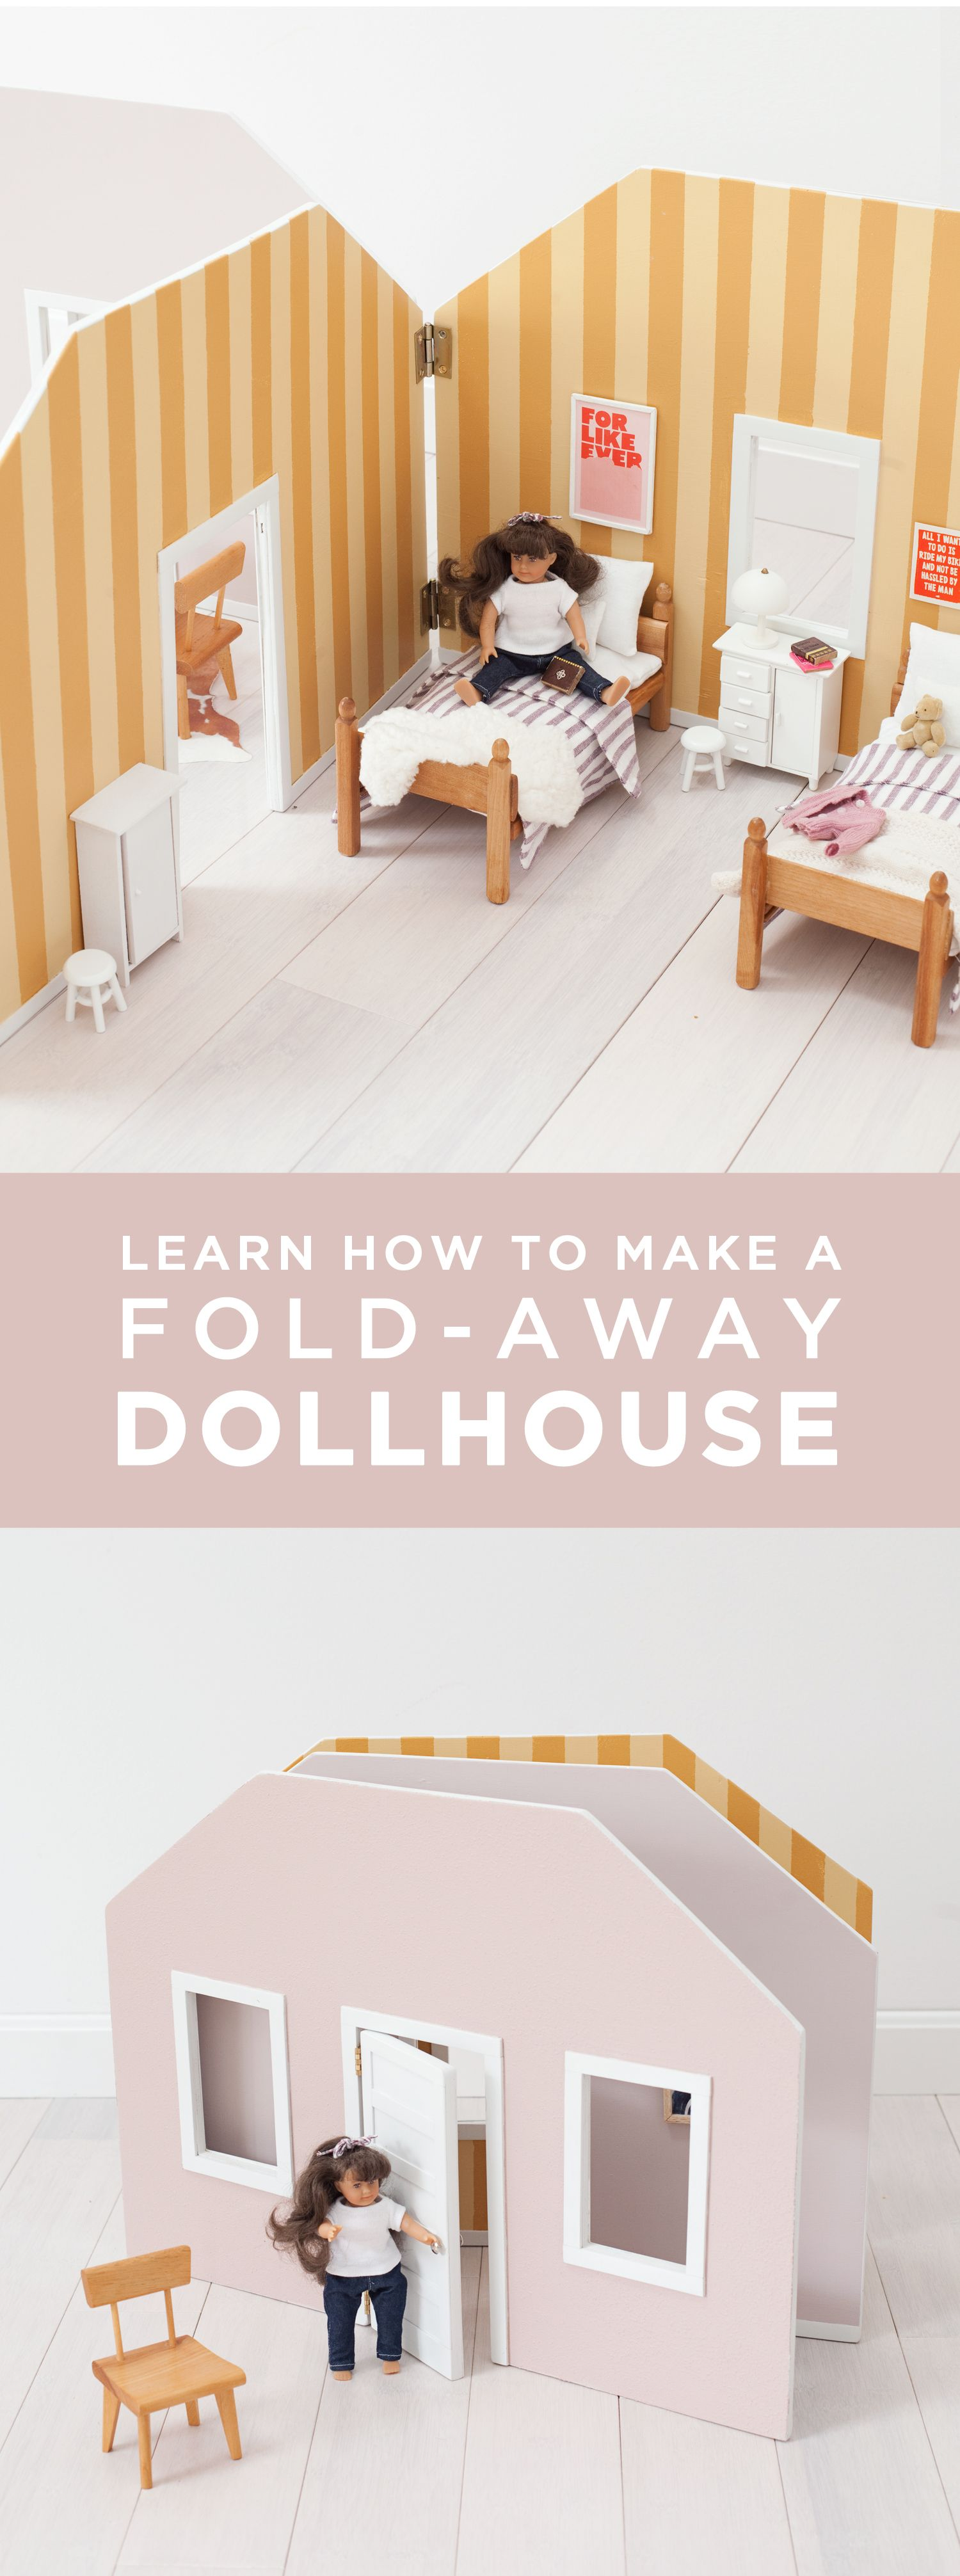 Car interior decoration toys  Foldaway dollhouse DIY  dibujopintura y manualidades  Pinterest